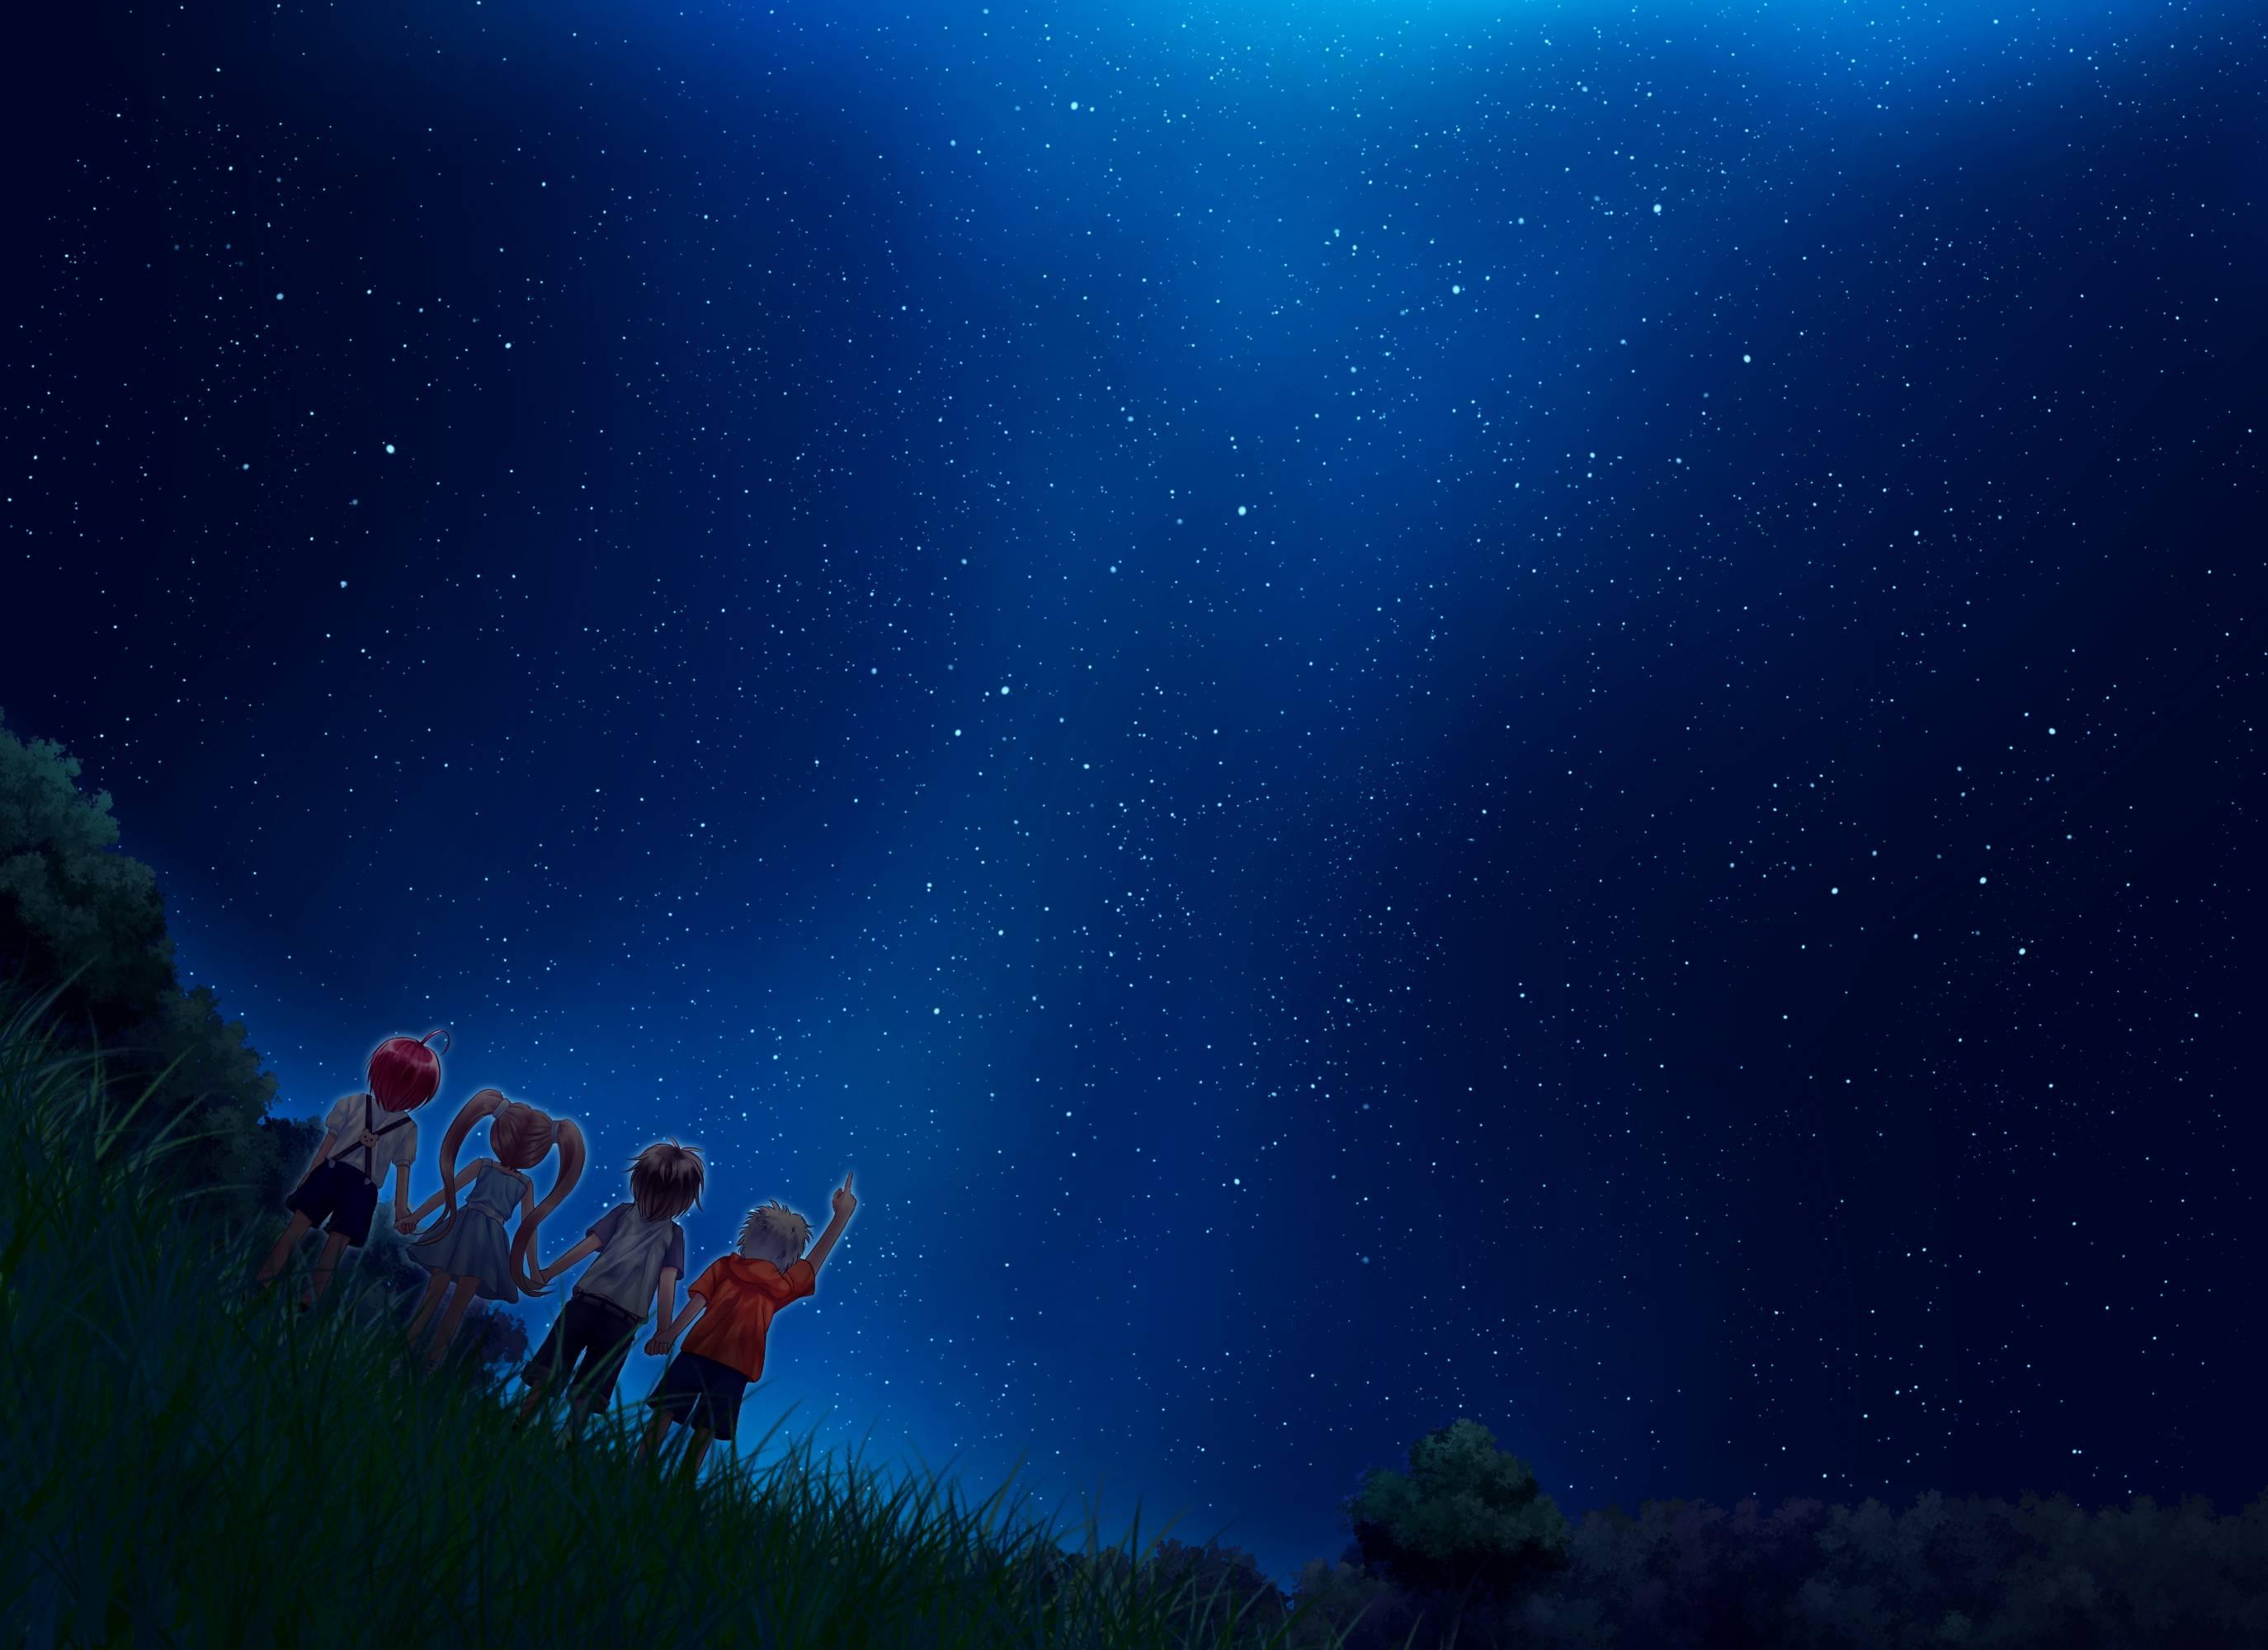 Anime Night Sky Wallpapers Top Free Anime Night Sky Backgrounds